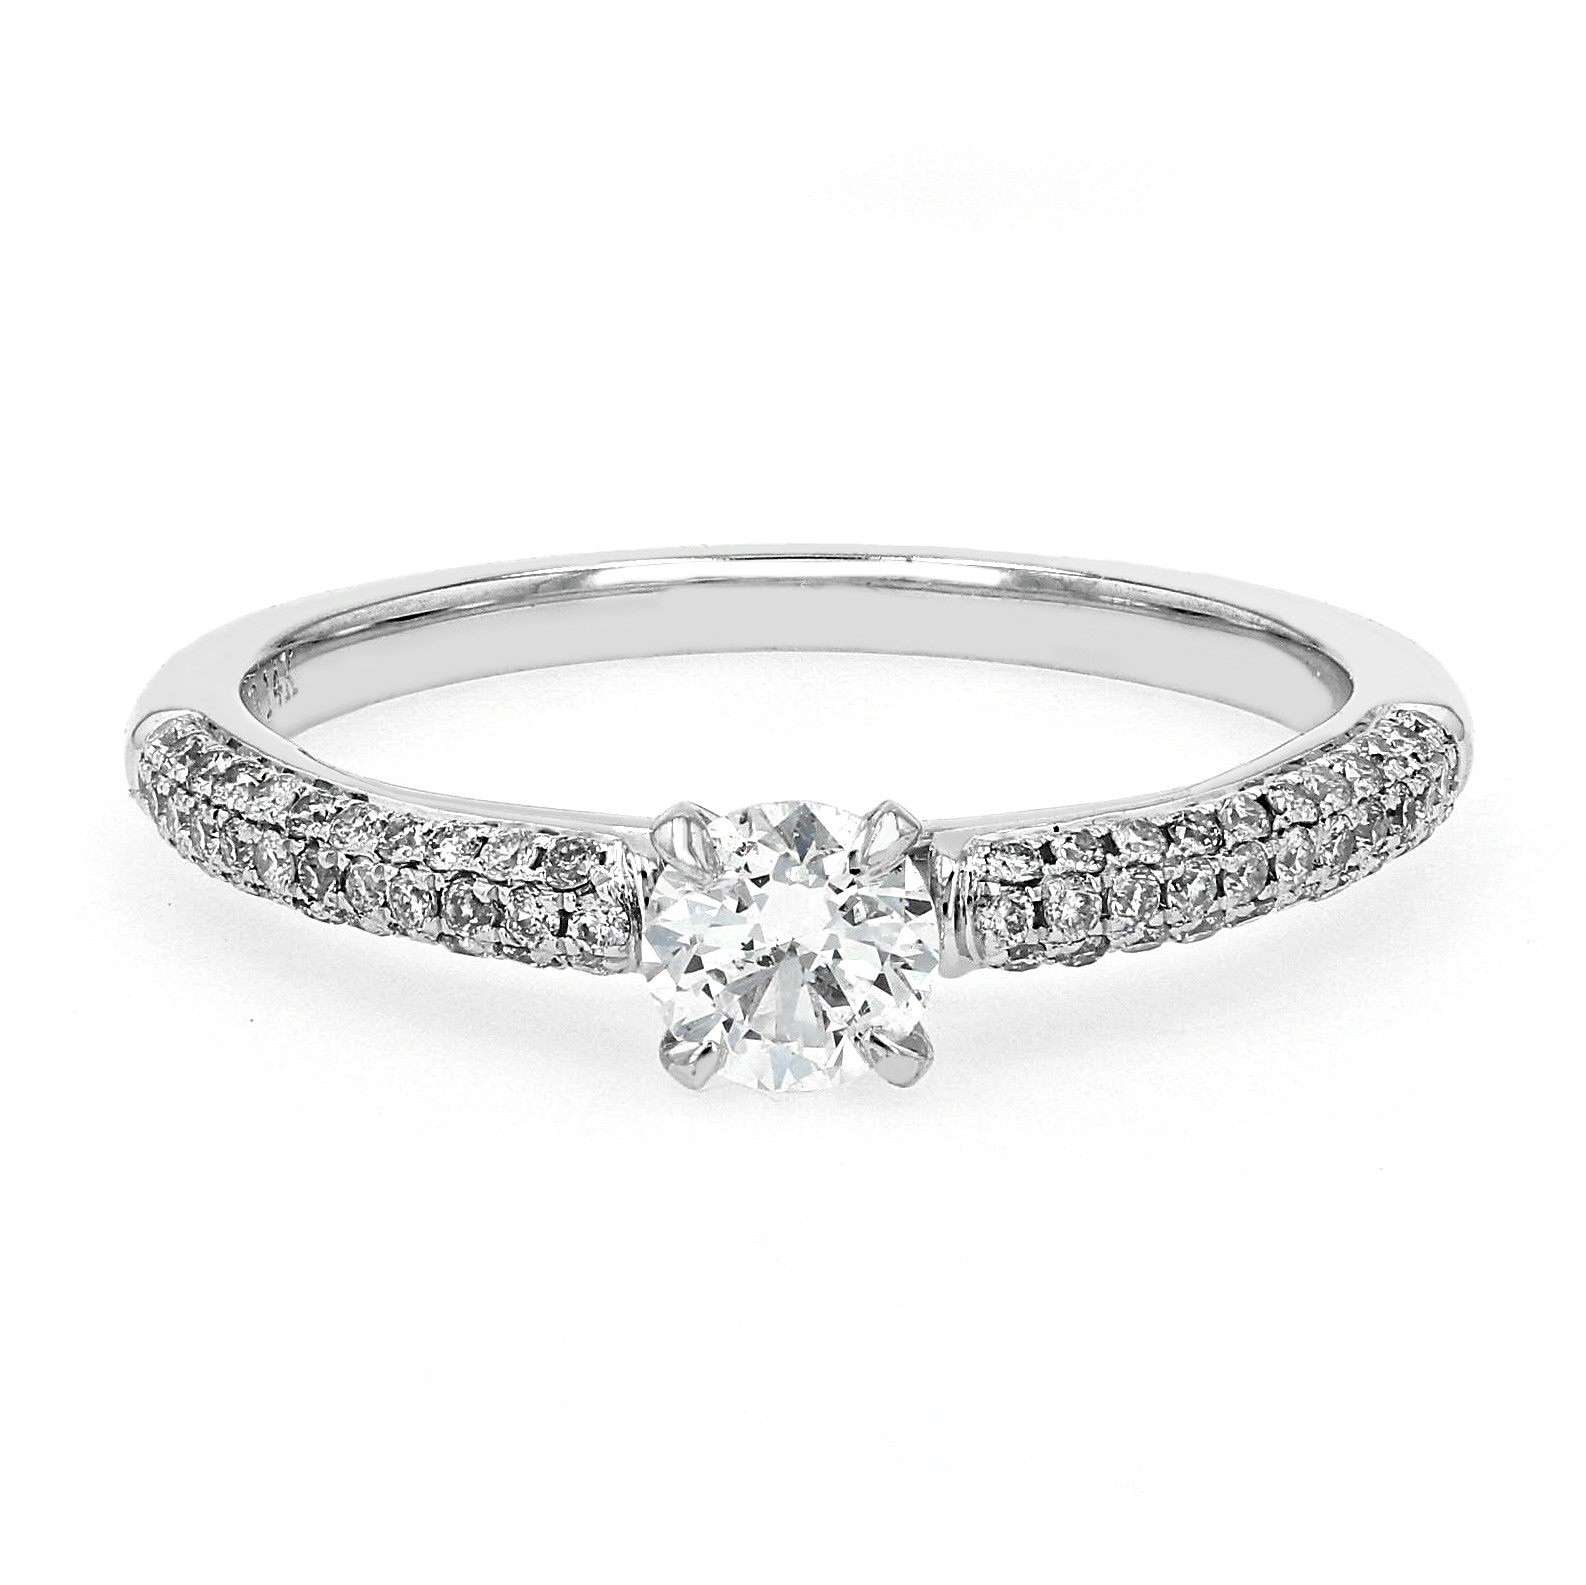 0 75tw Prive Micro Pave Canadian Diamond Engagement Ring La Mine D Or Moncton Nb